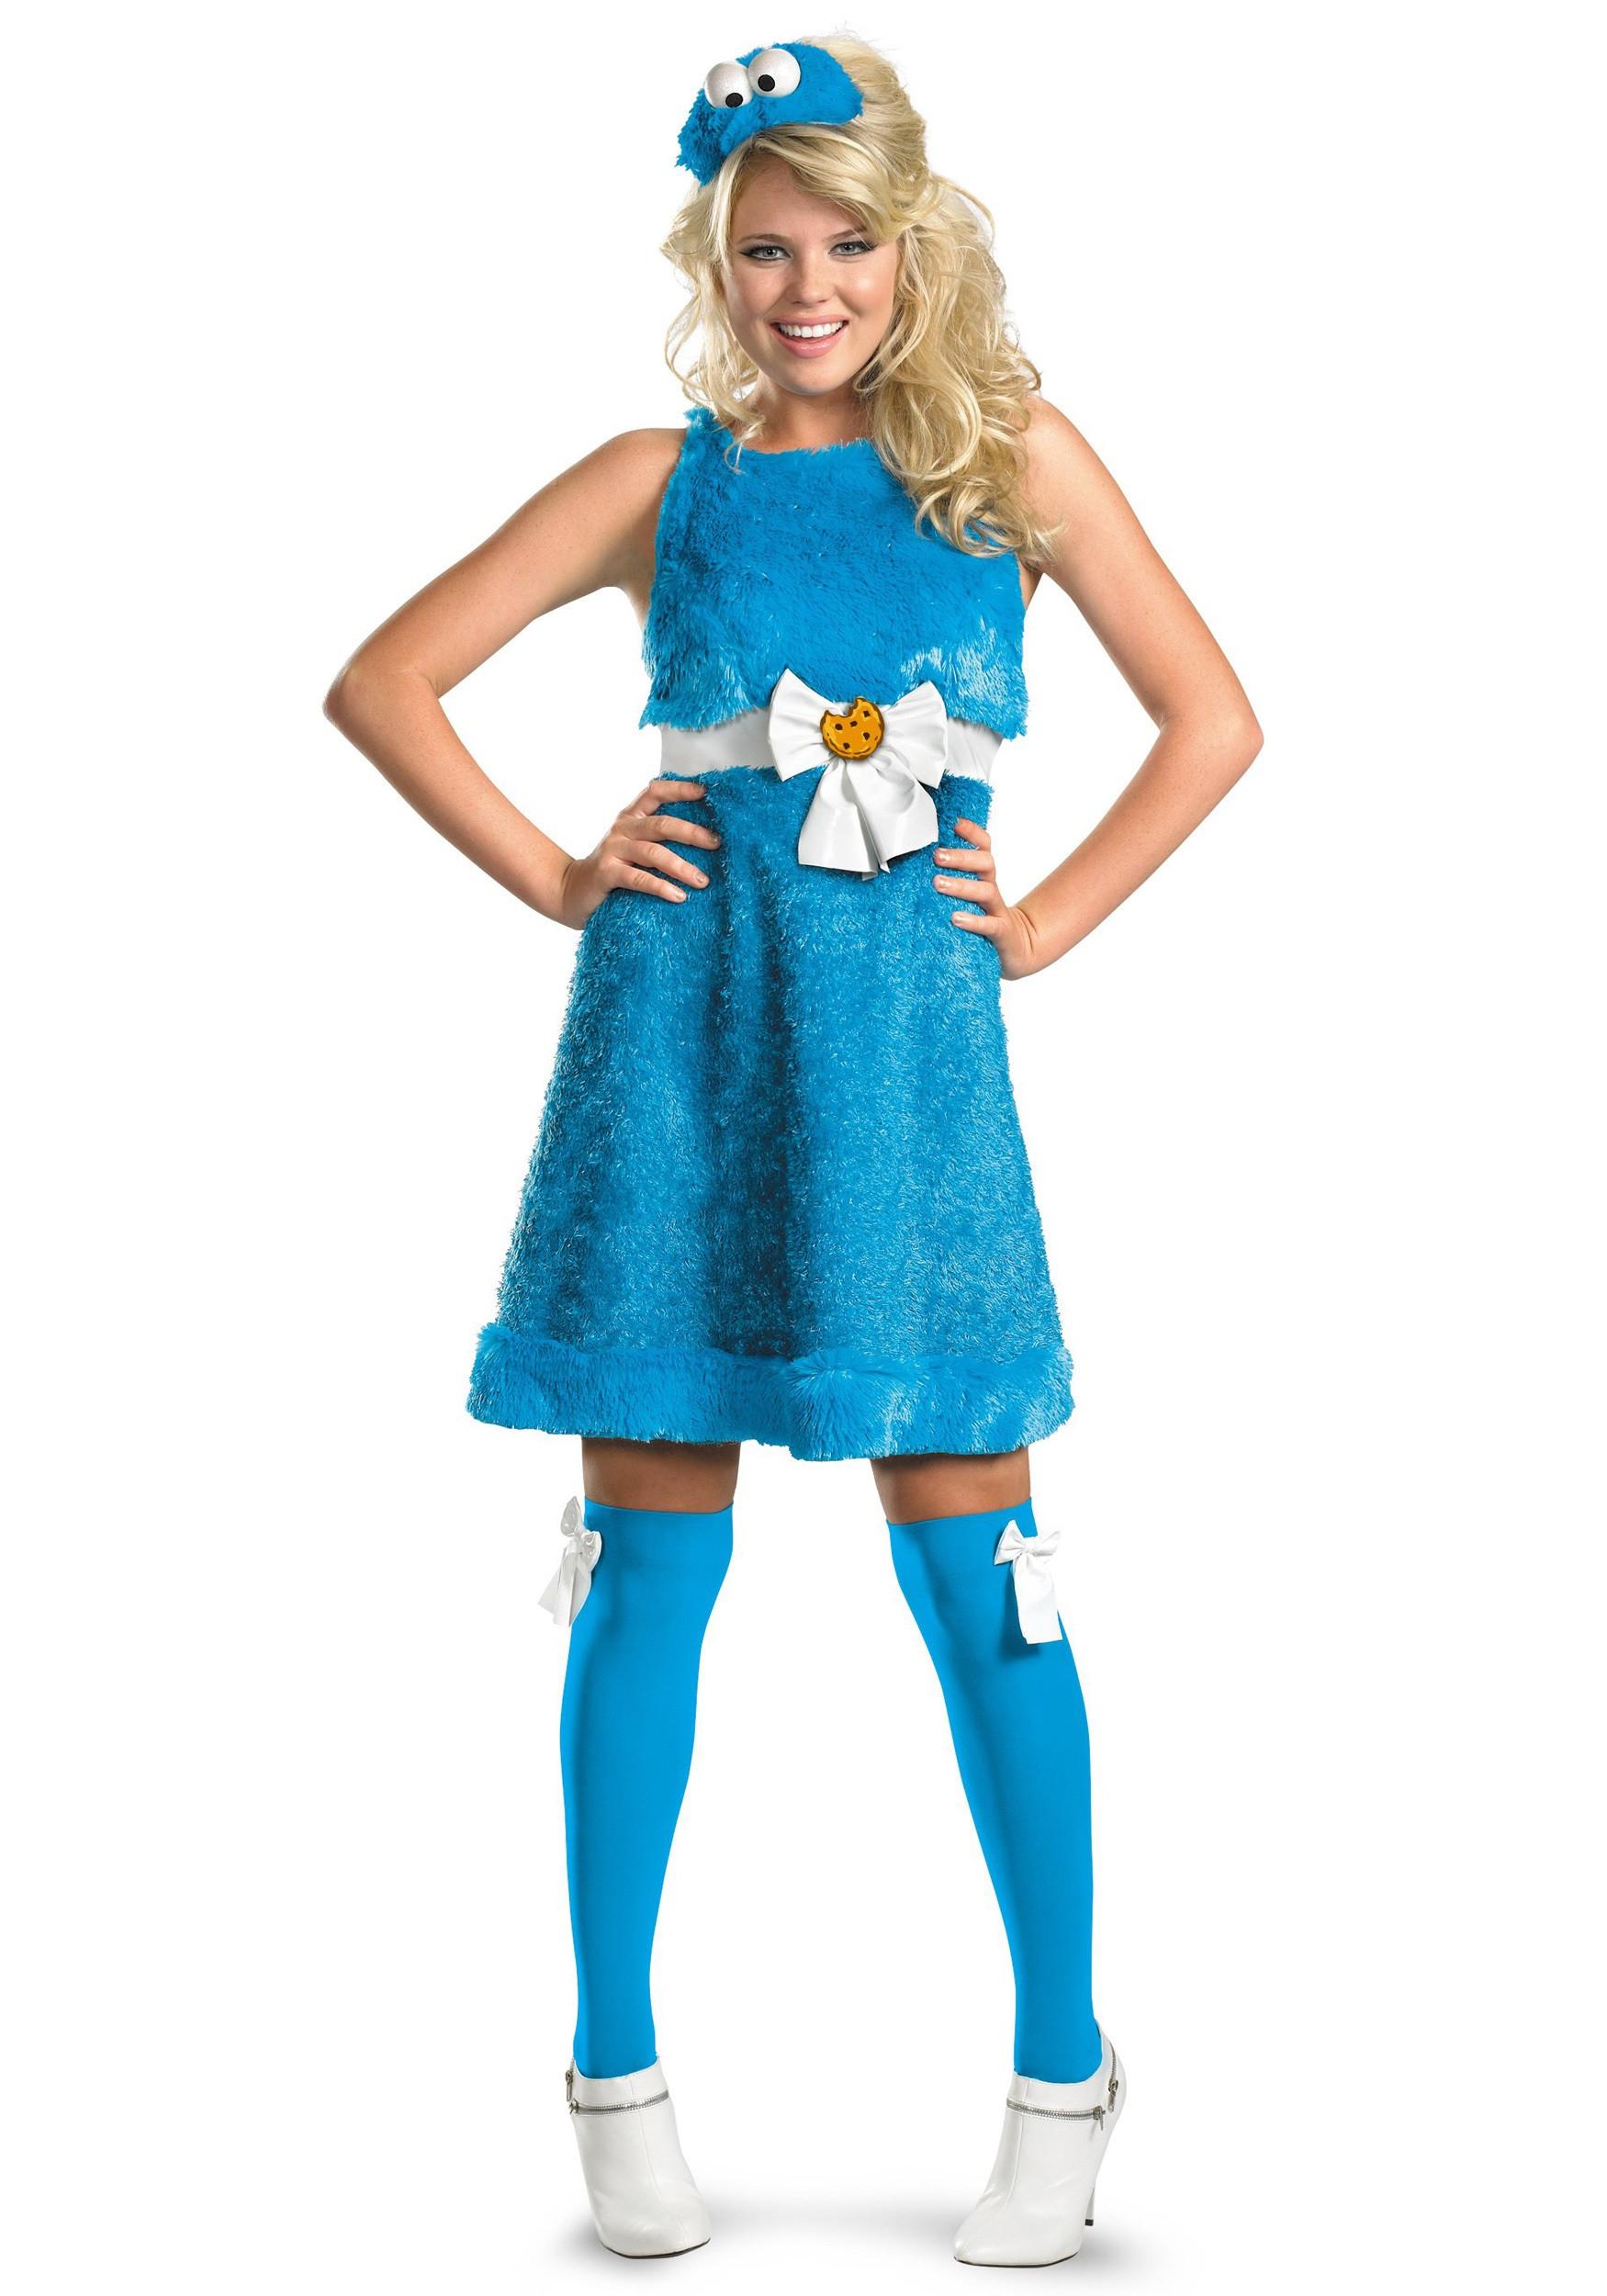 Cookies Halloween Costumes  Sassy Cookie Monster Costume